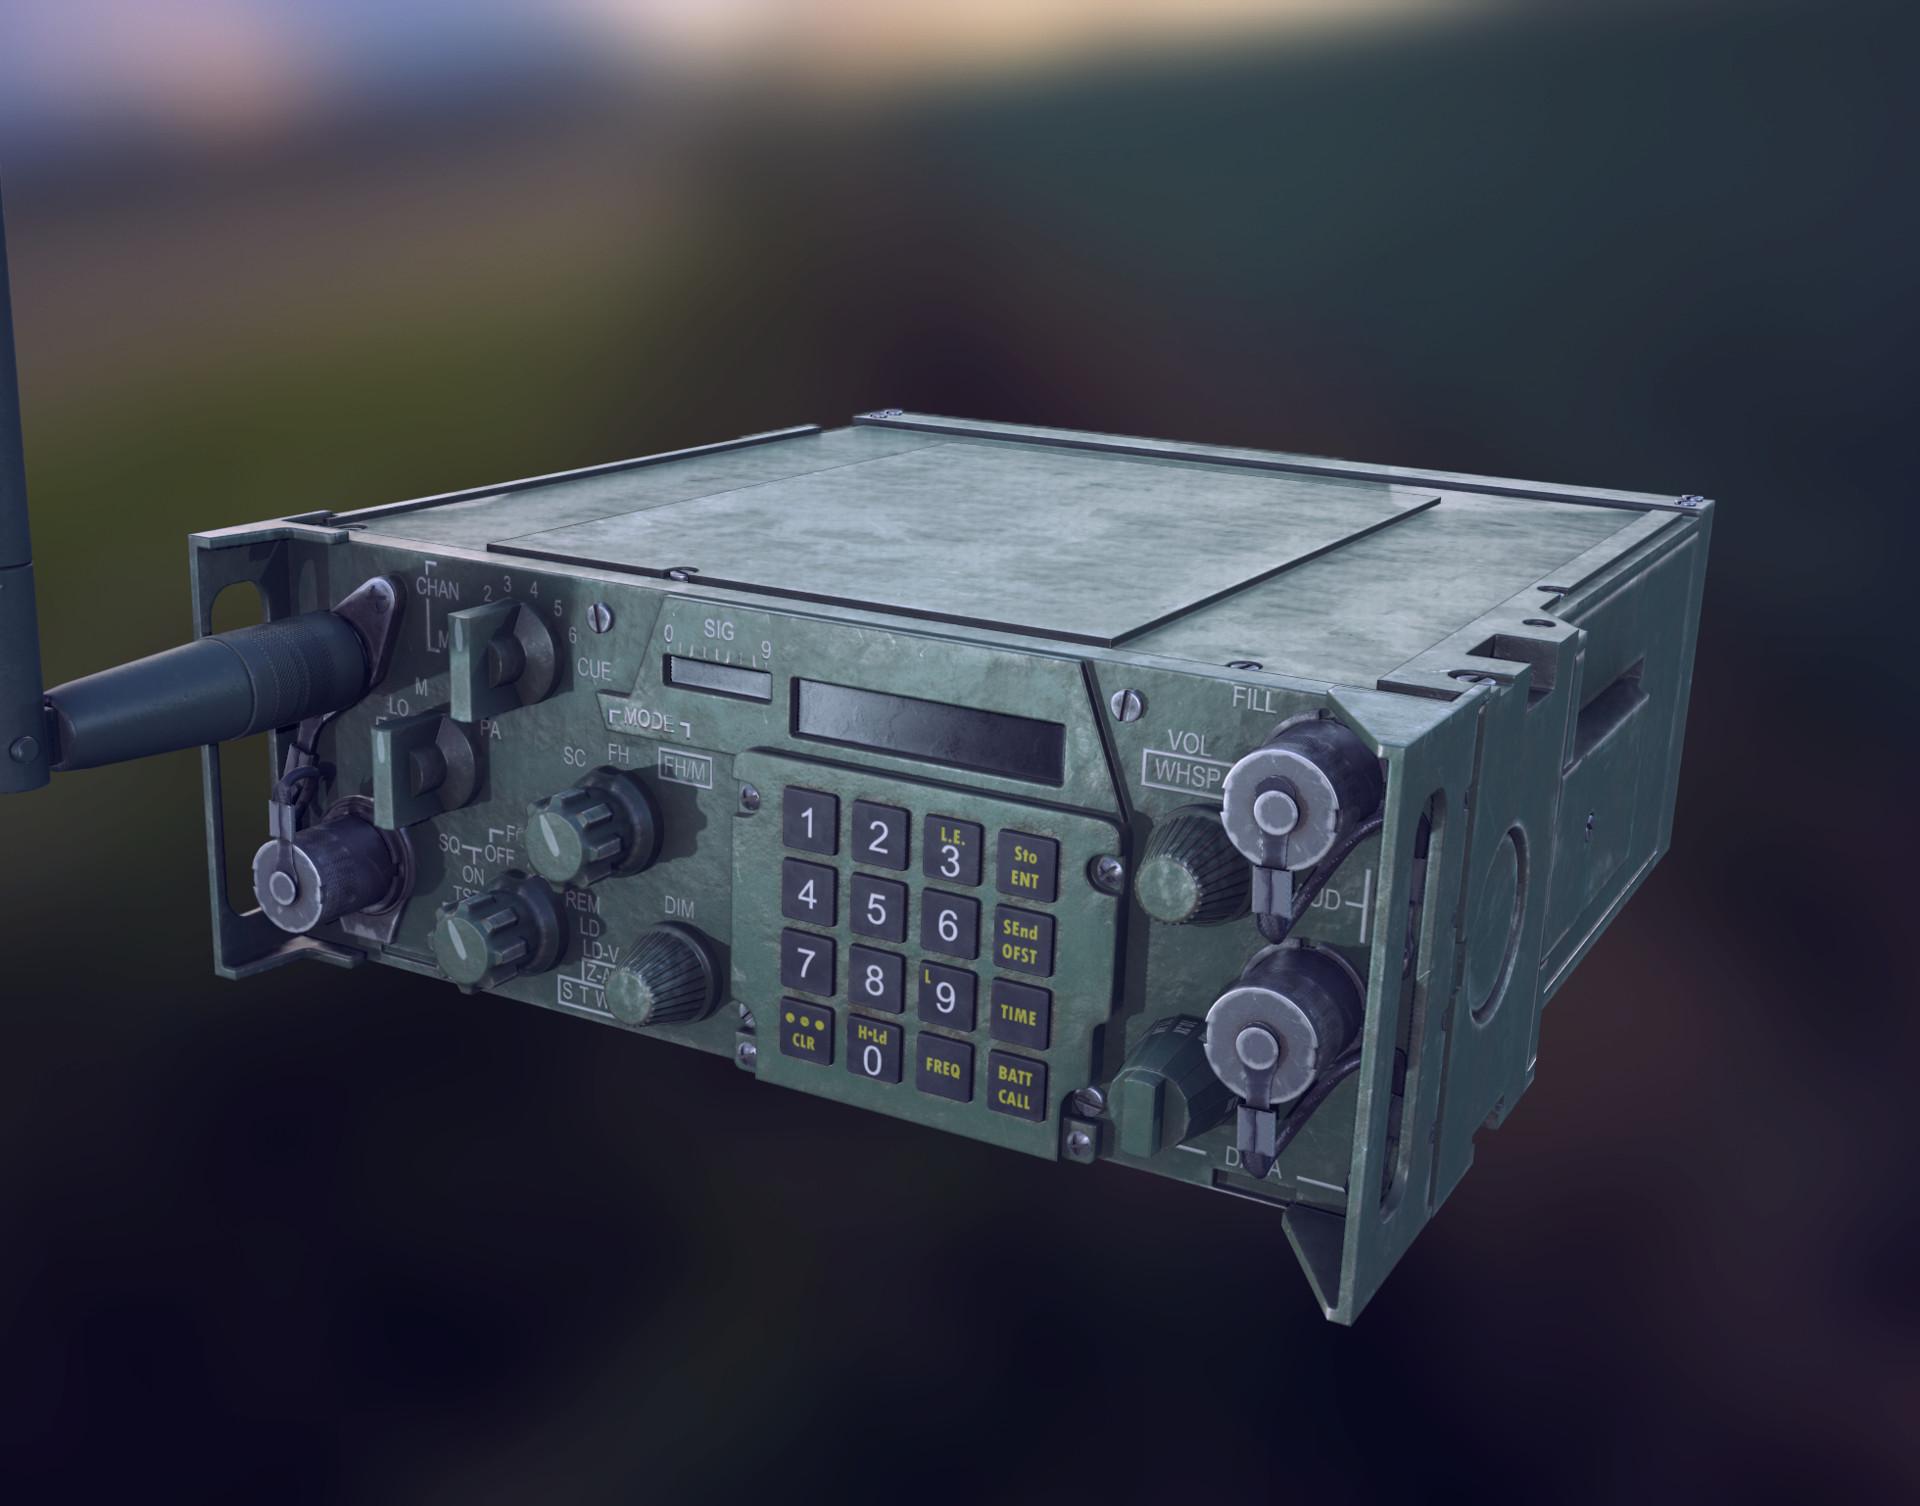 ArtStation - PRC 119 Military Radio, Nick Barone